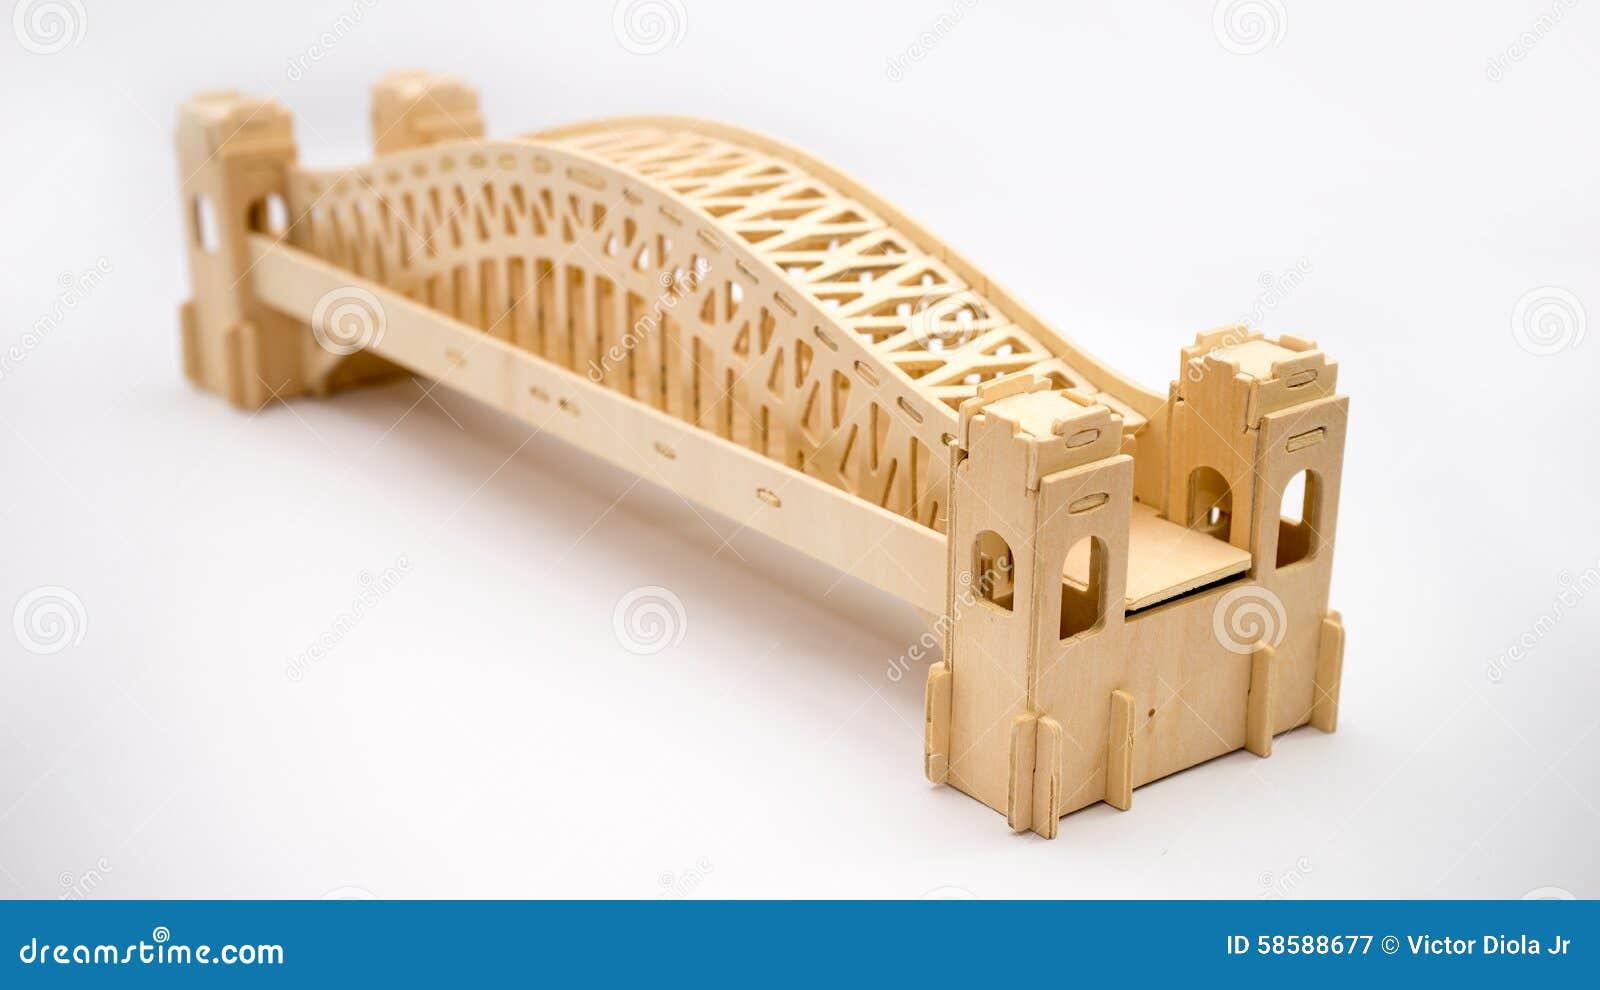 Sydney Harbour Bridge Woodcraft Model Stock Photo - Image ...